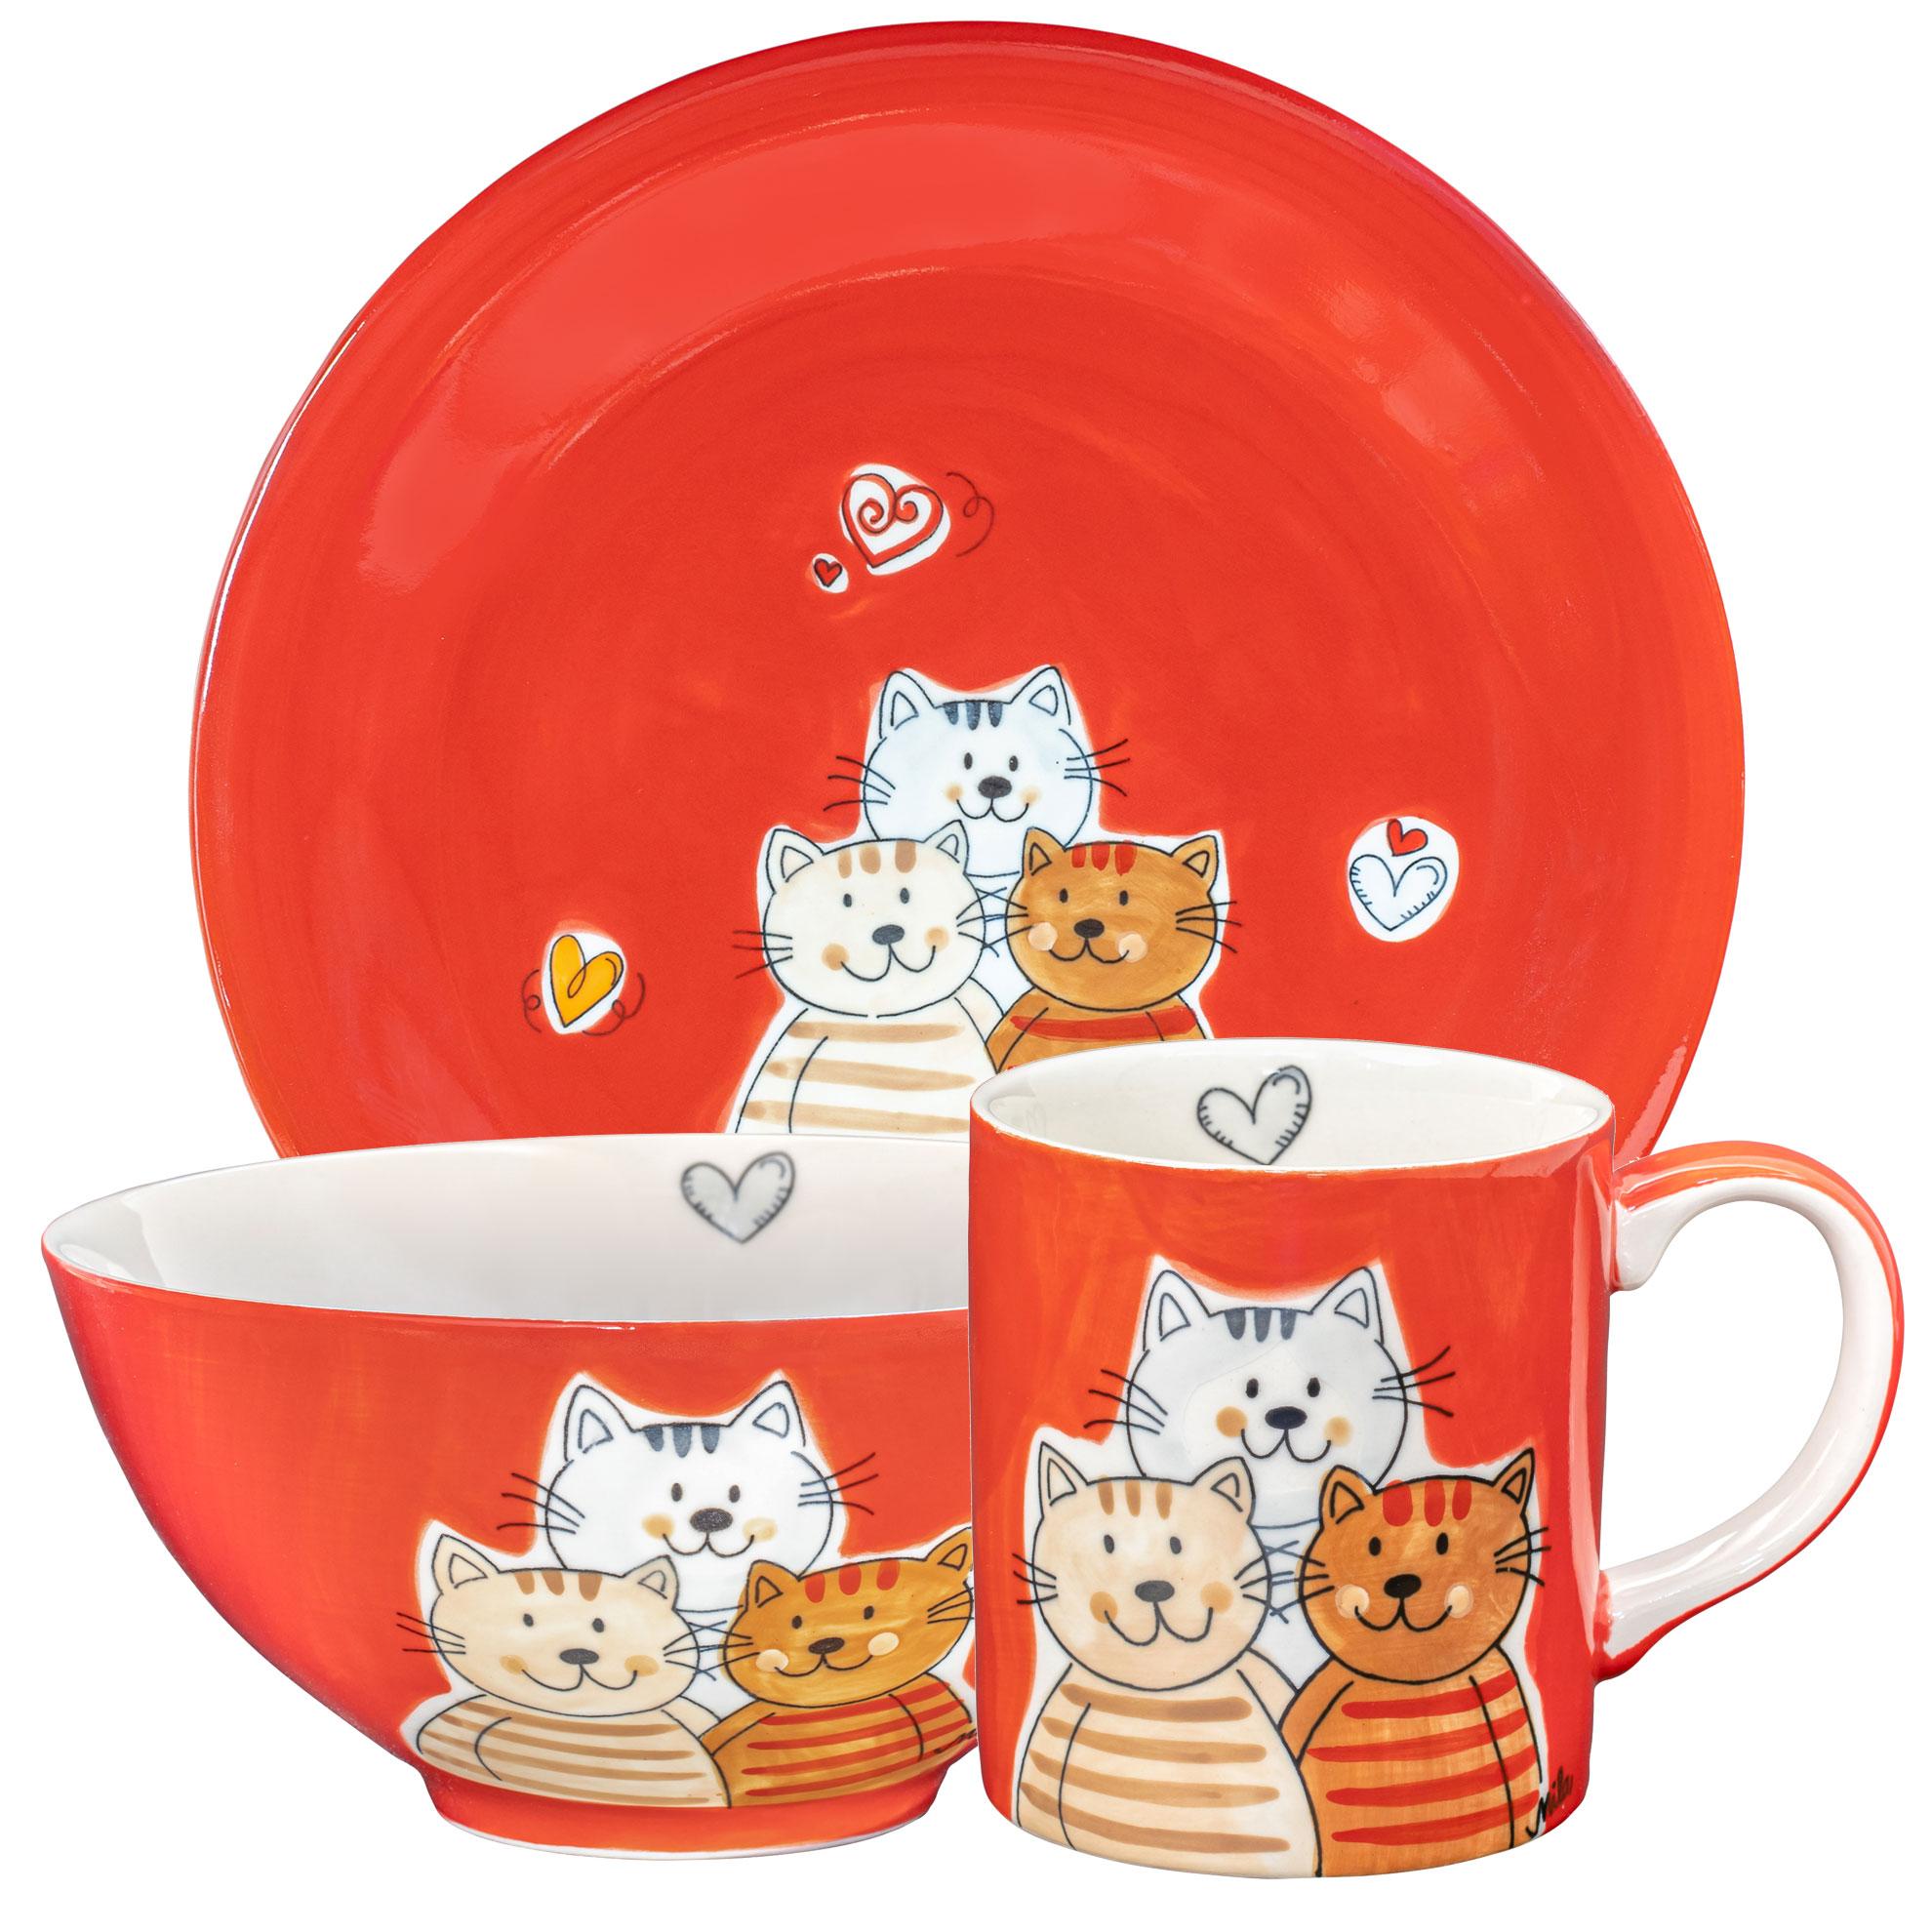 Sammler Set - Cuddly Cats